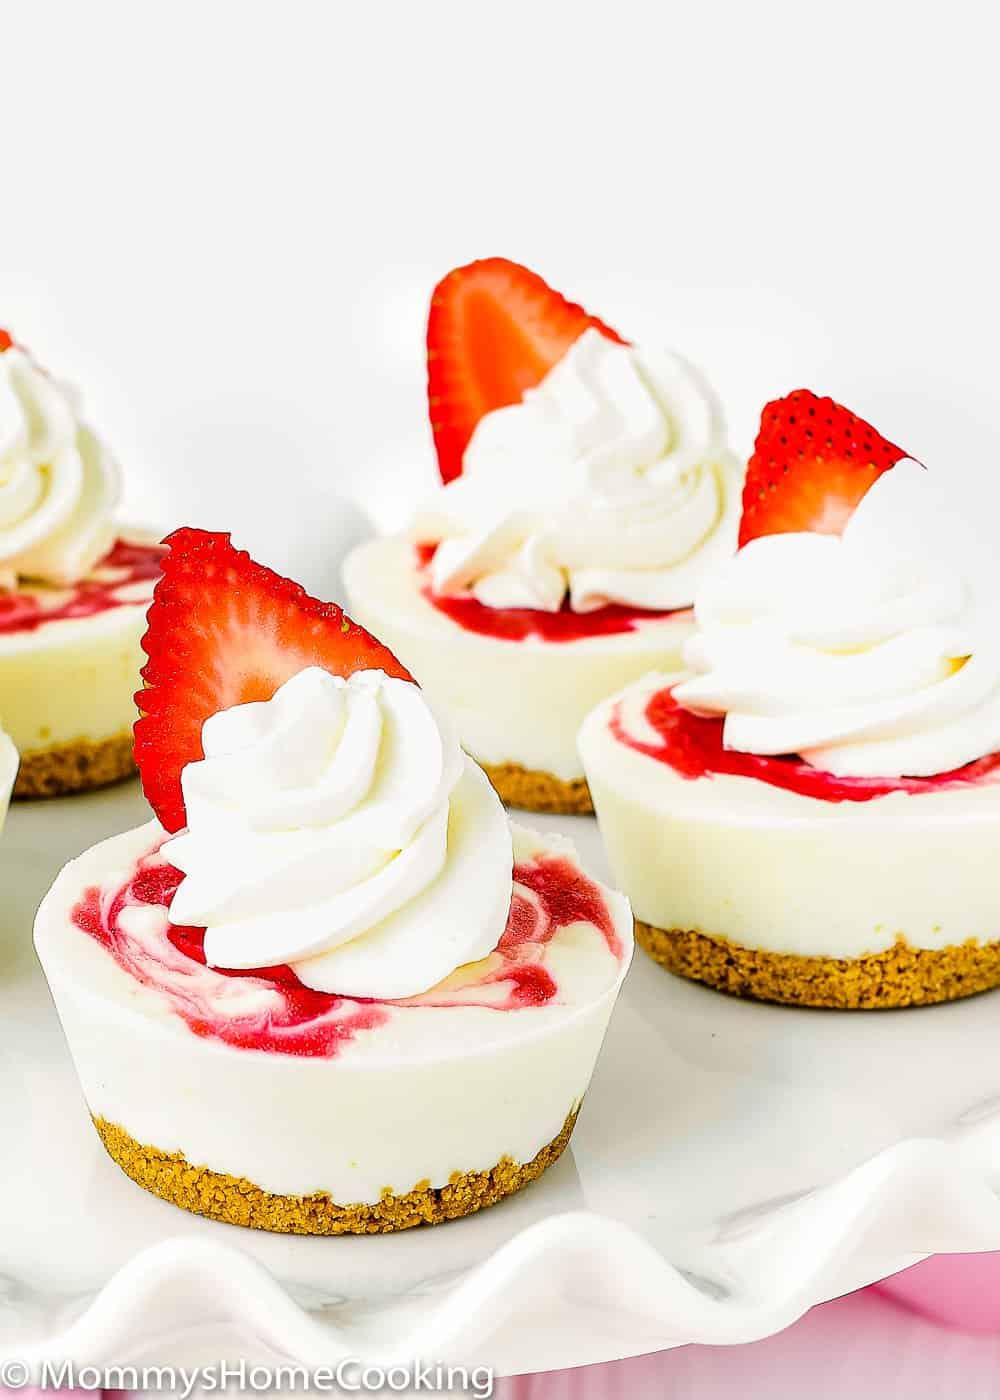 Mini Greek Yogurt Strawberry Cheesecakes with whipped cream